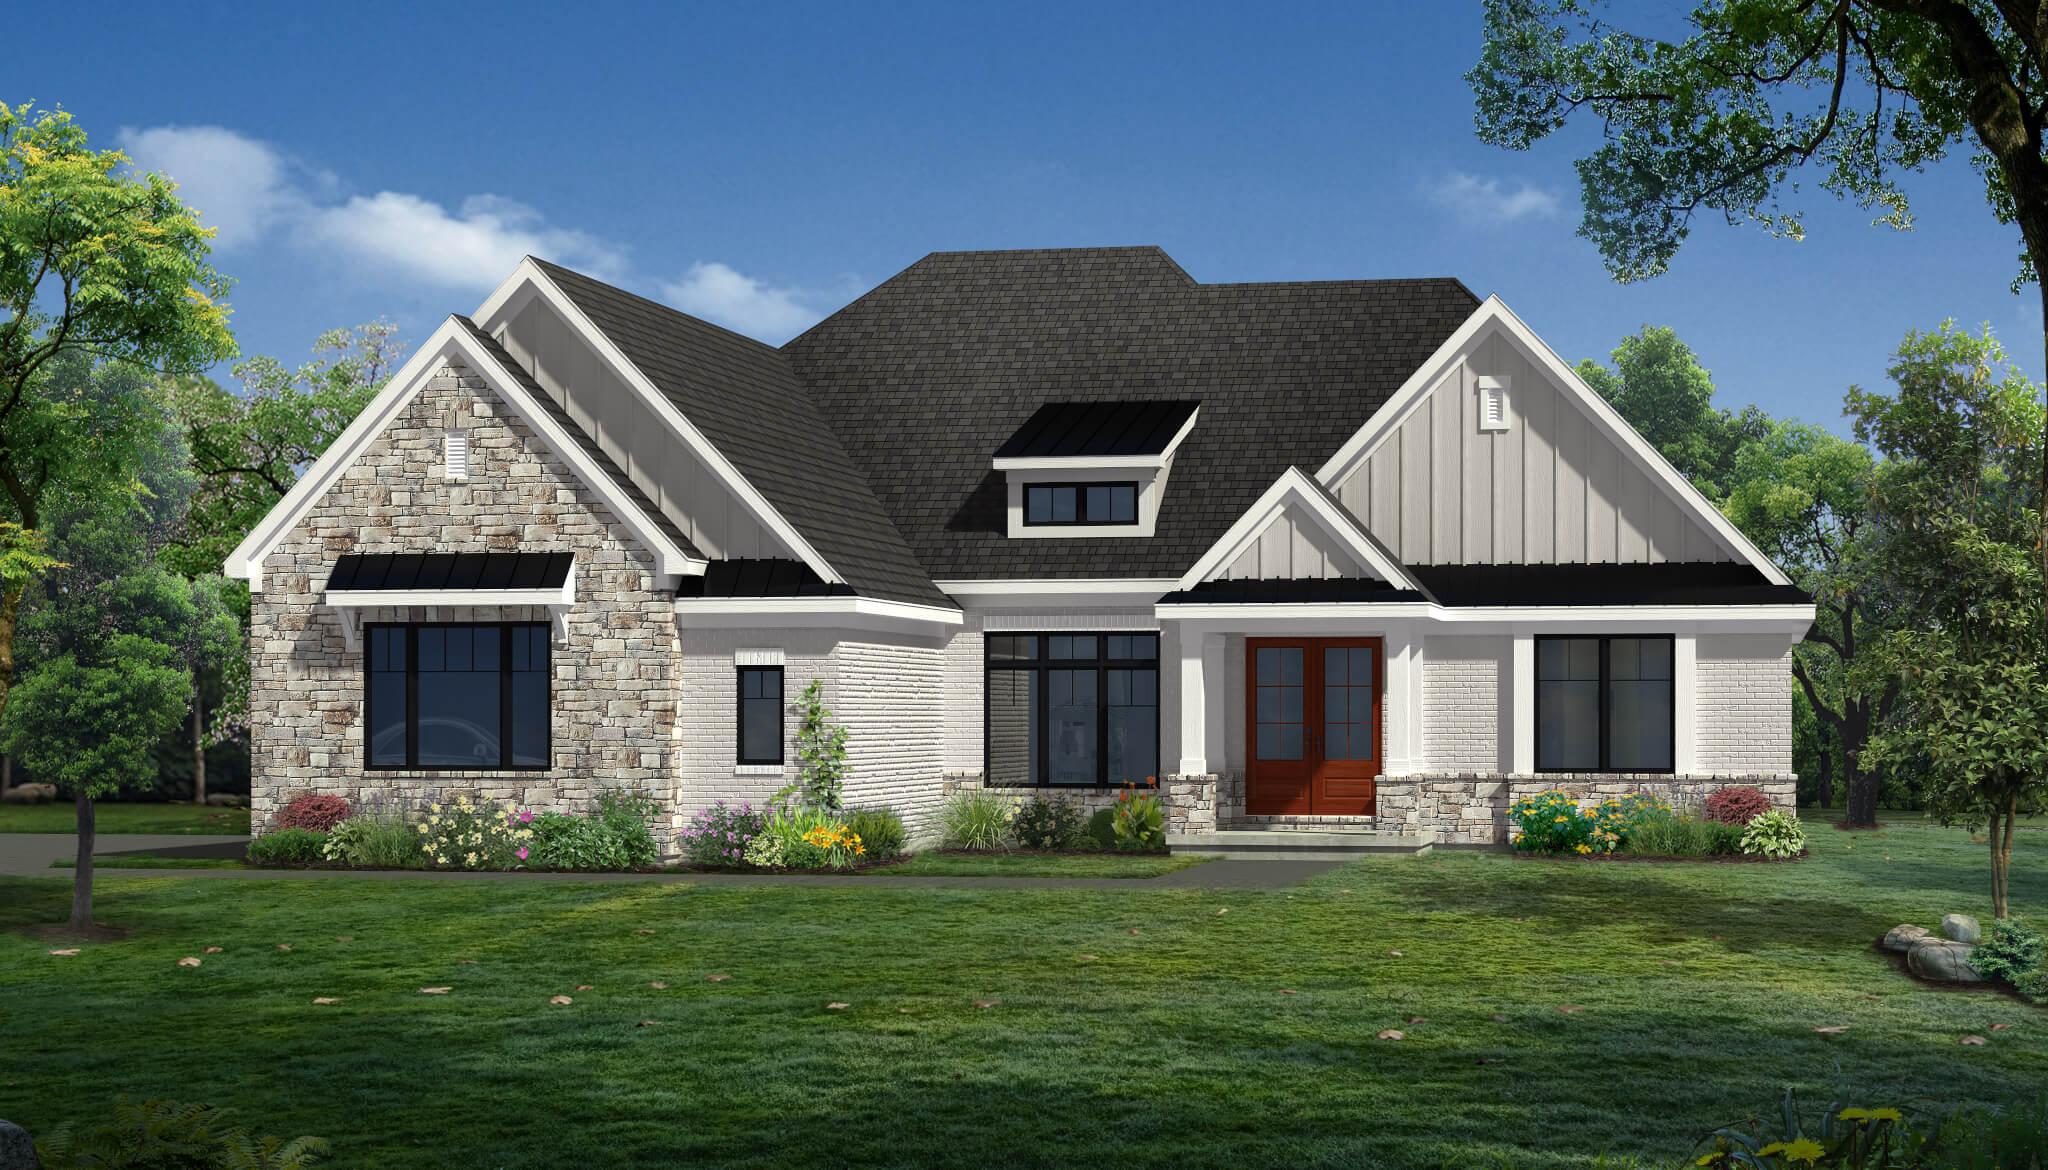 New homes in Mason